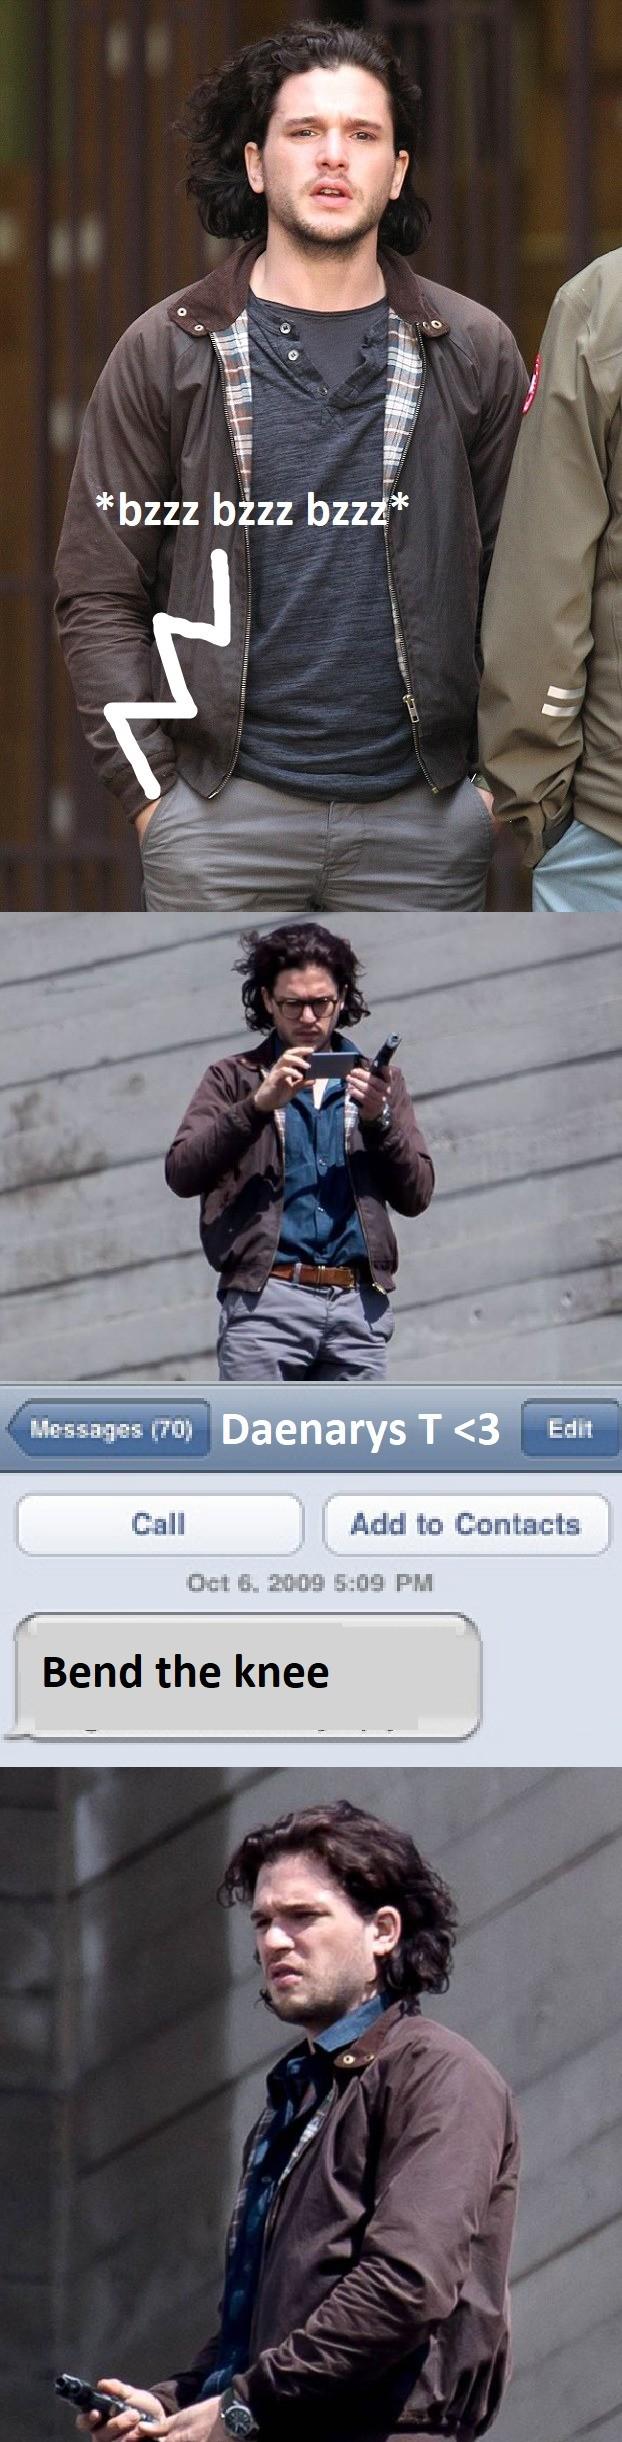 Daenarys T, Mother of this D. . bendy Knee